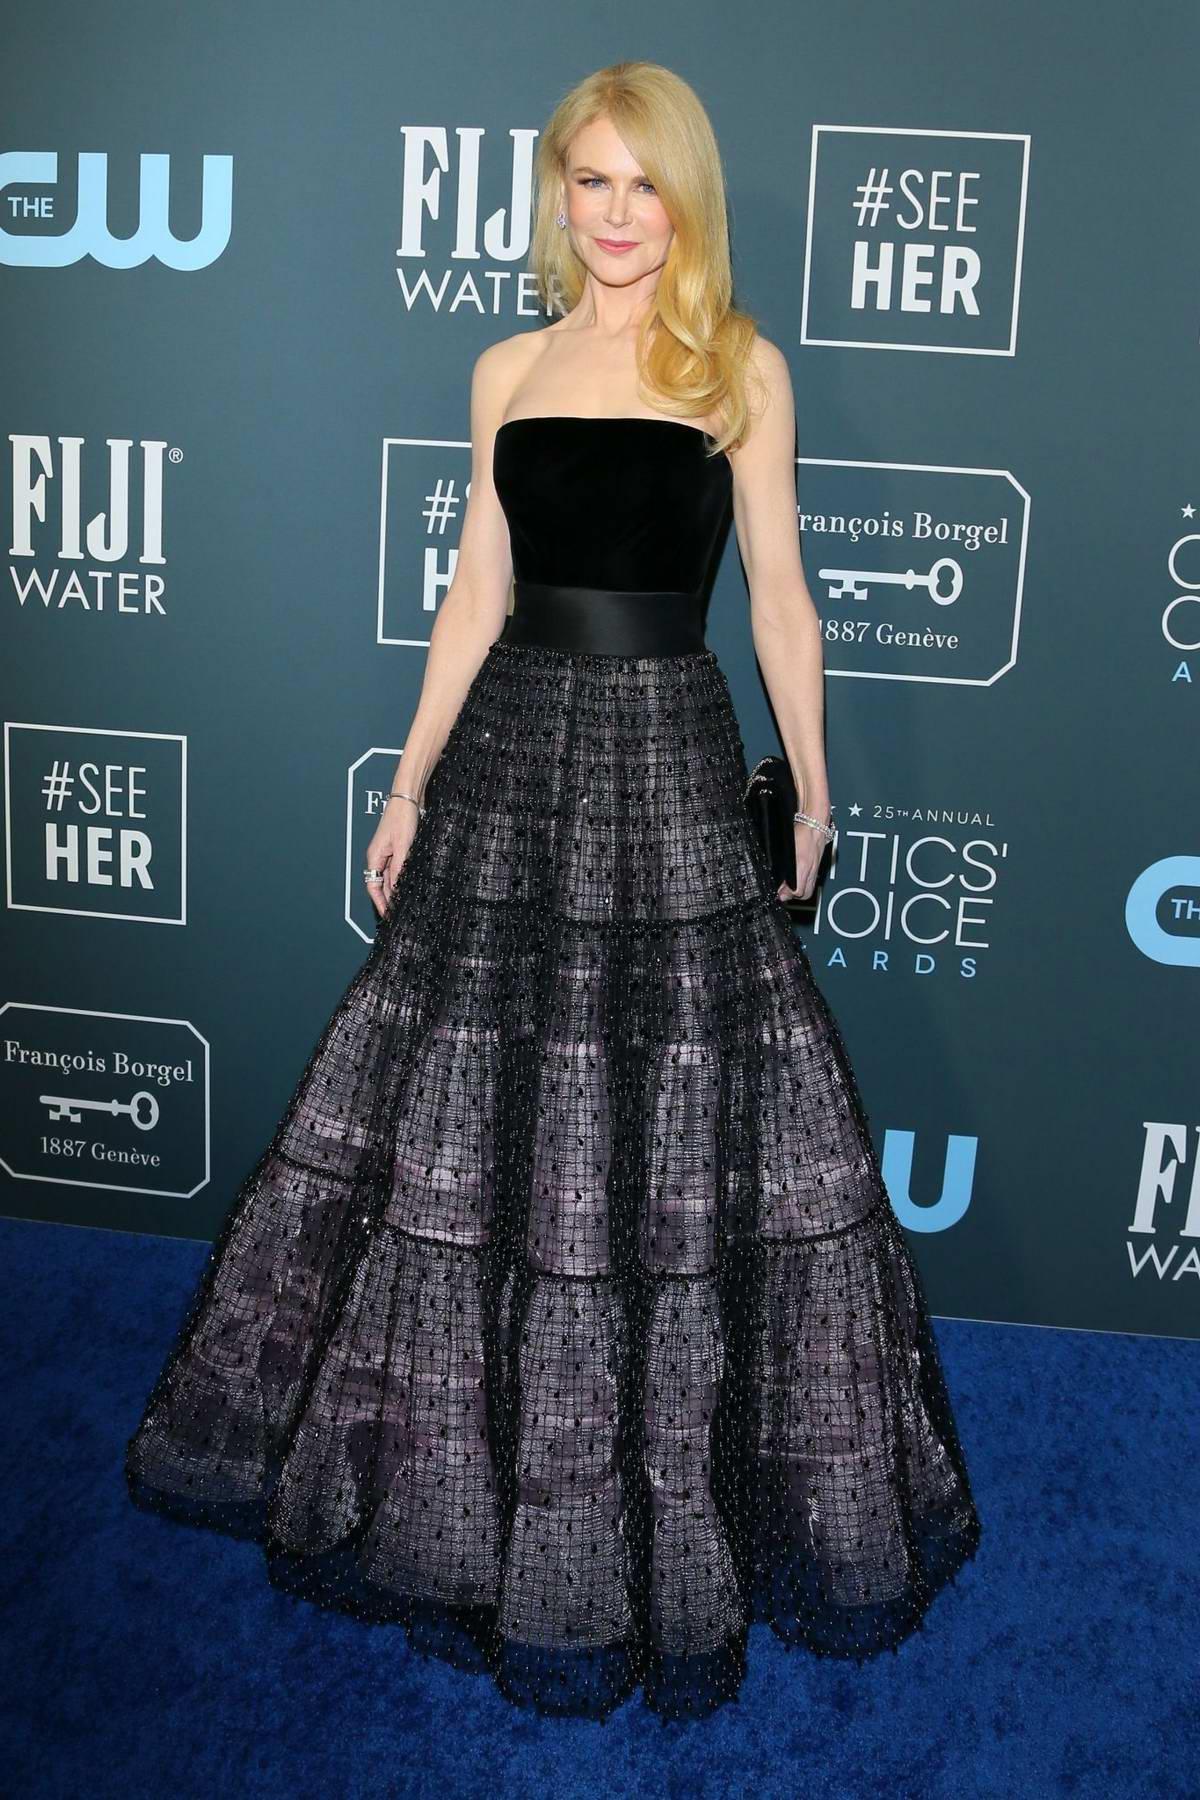 Nicole Kidman attends the 25th Annual Critics' Choice Awards at Barker Hangar in Santa Monica, California